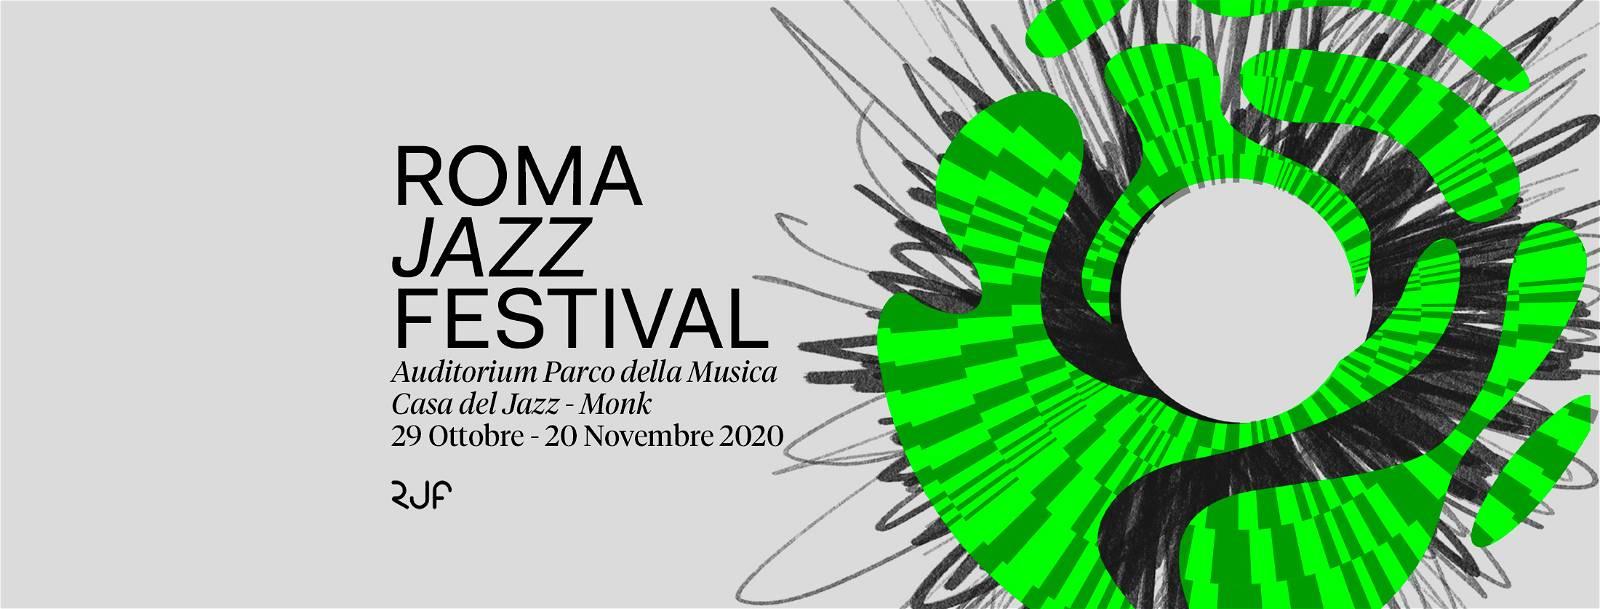 Roma Jazz Festival 2020 locandina